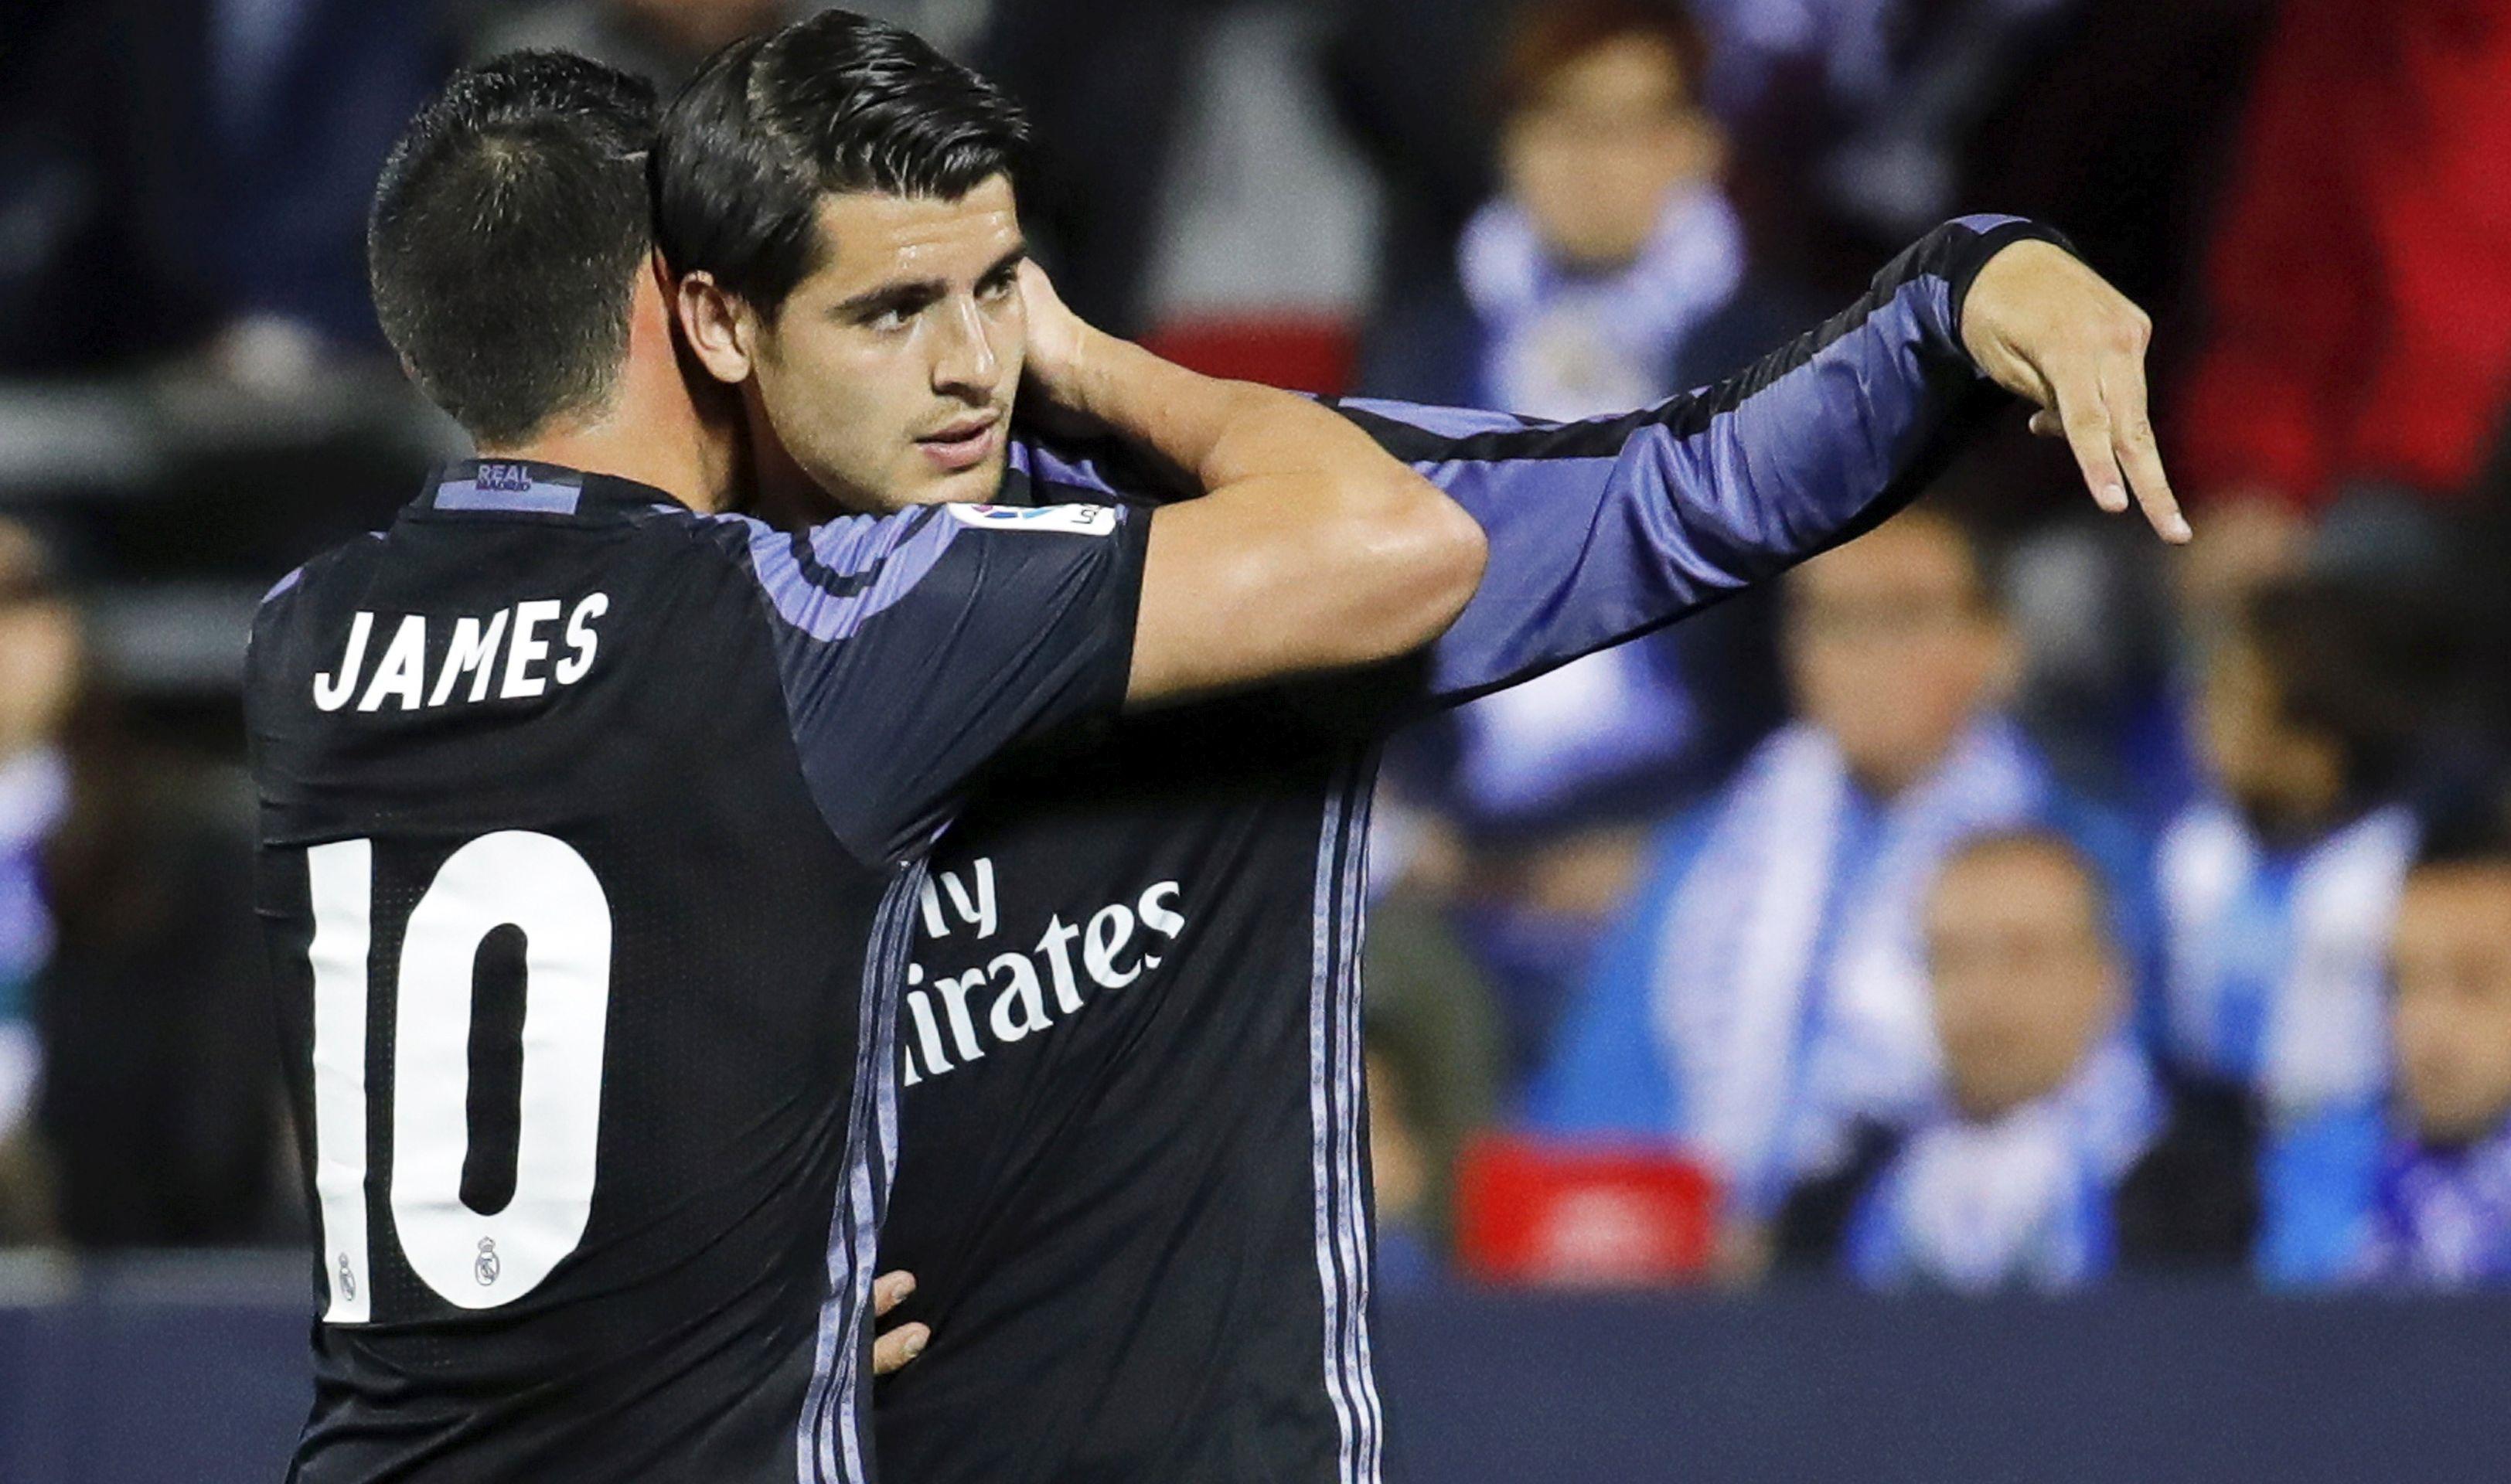 ŠPANJOLSKA Real Madrid slavio kod Leganesa, asistencija Kovačića